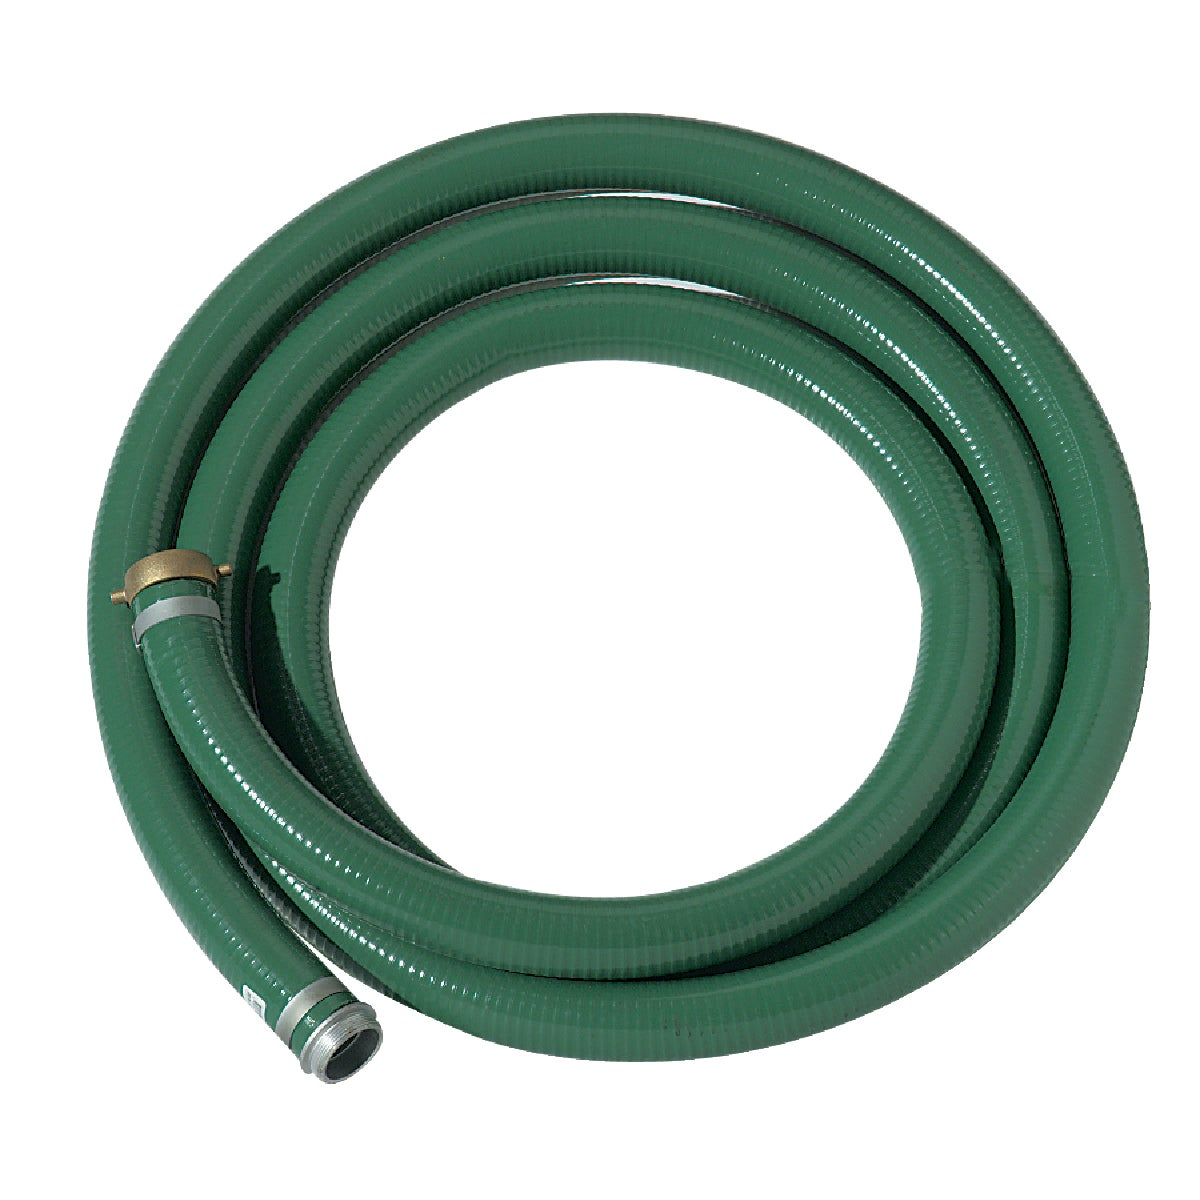 "2""X20' PVC SUCTION HOSE - 98128040 by Apache Hose Belting"